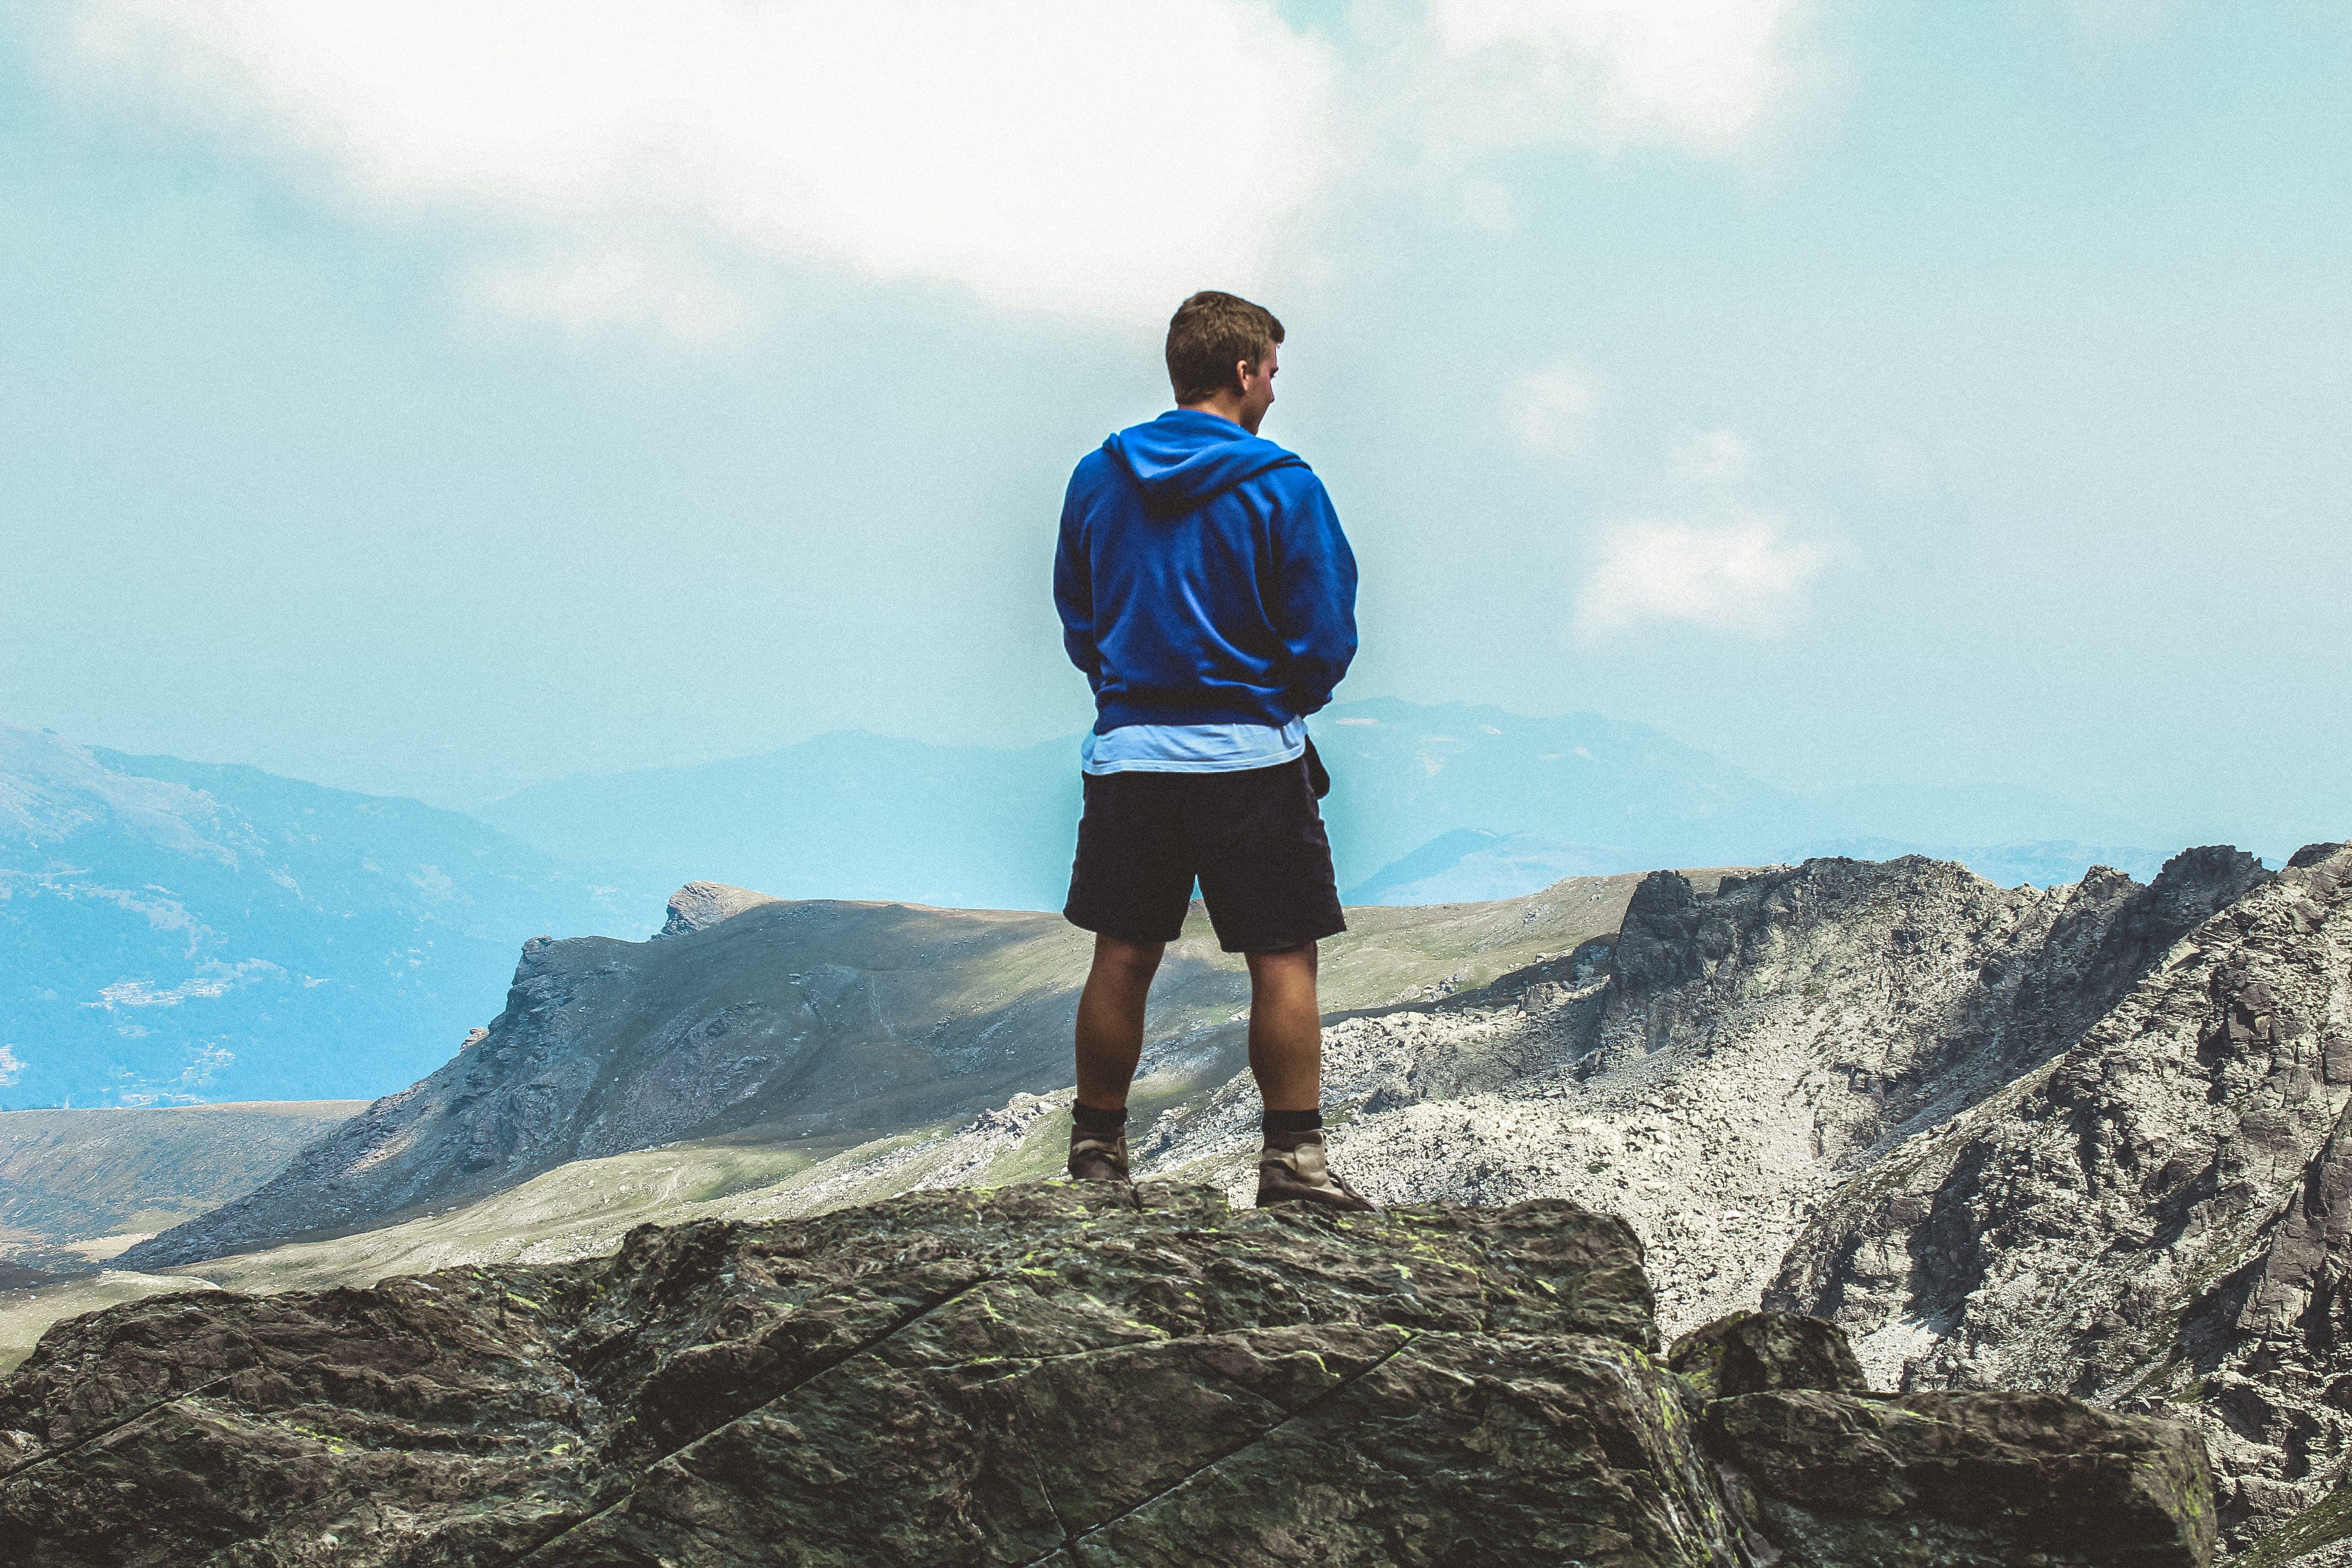 abenteuer, berg, bergsteigen